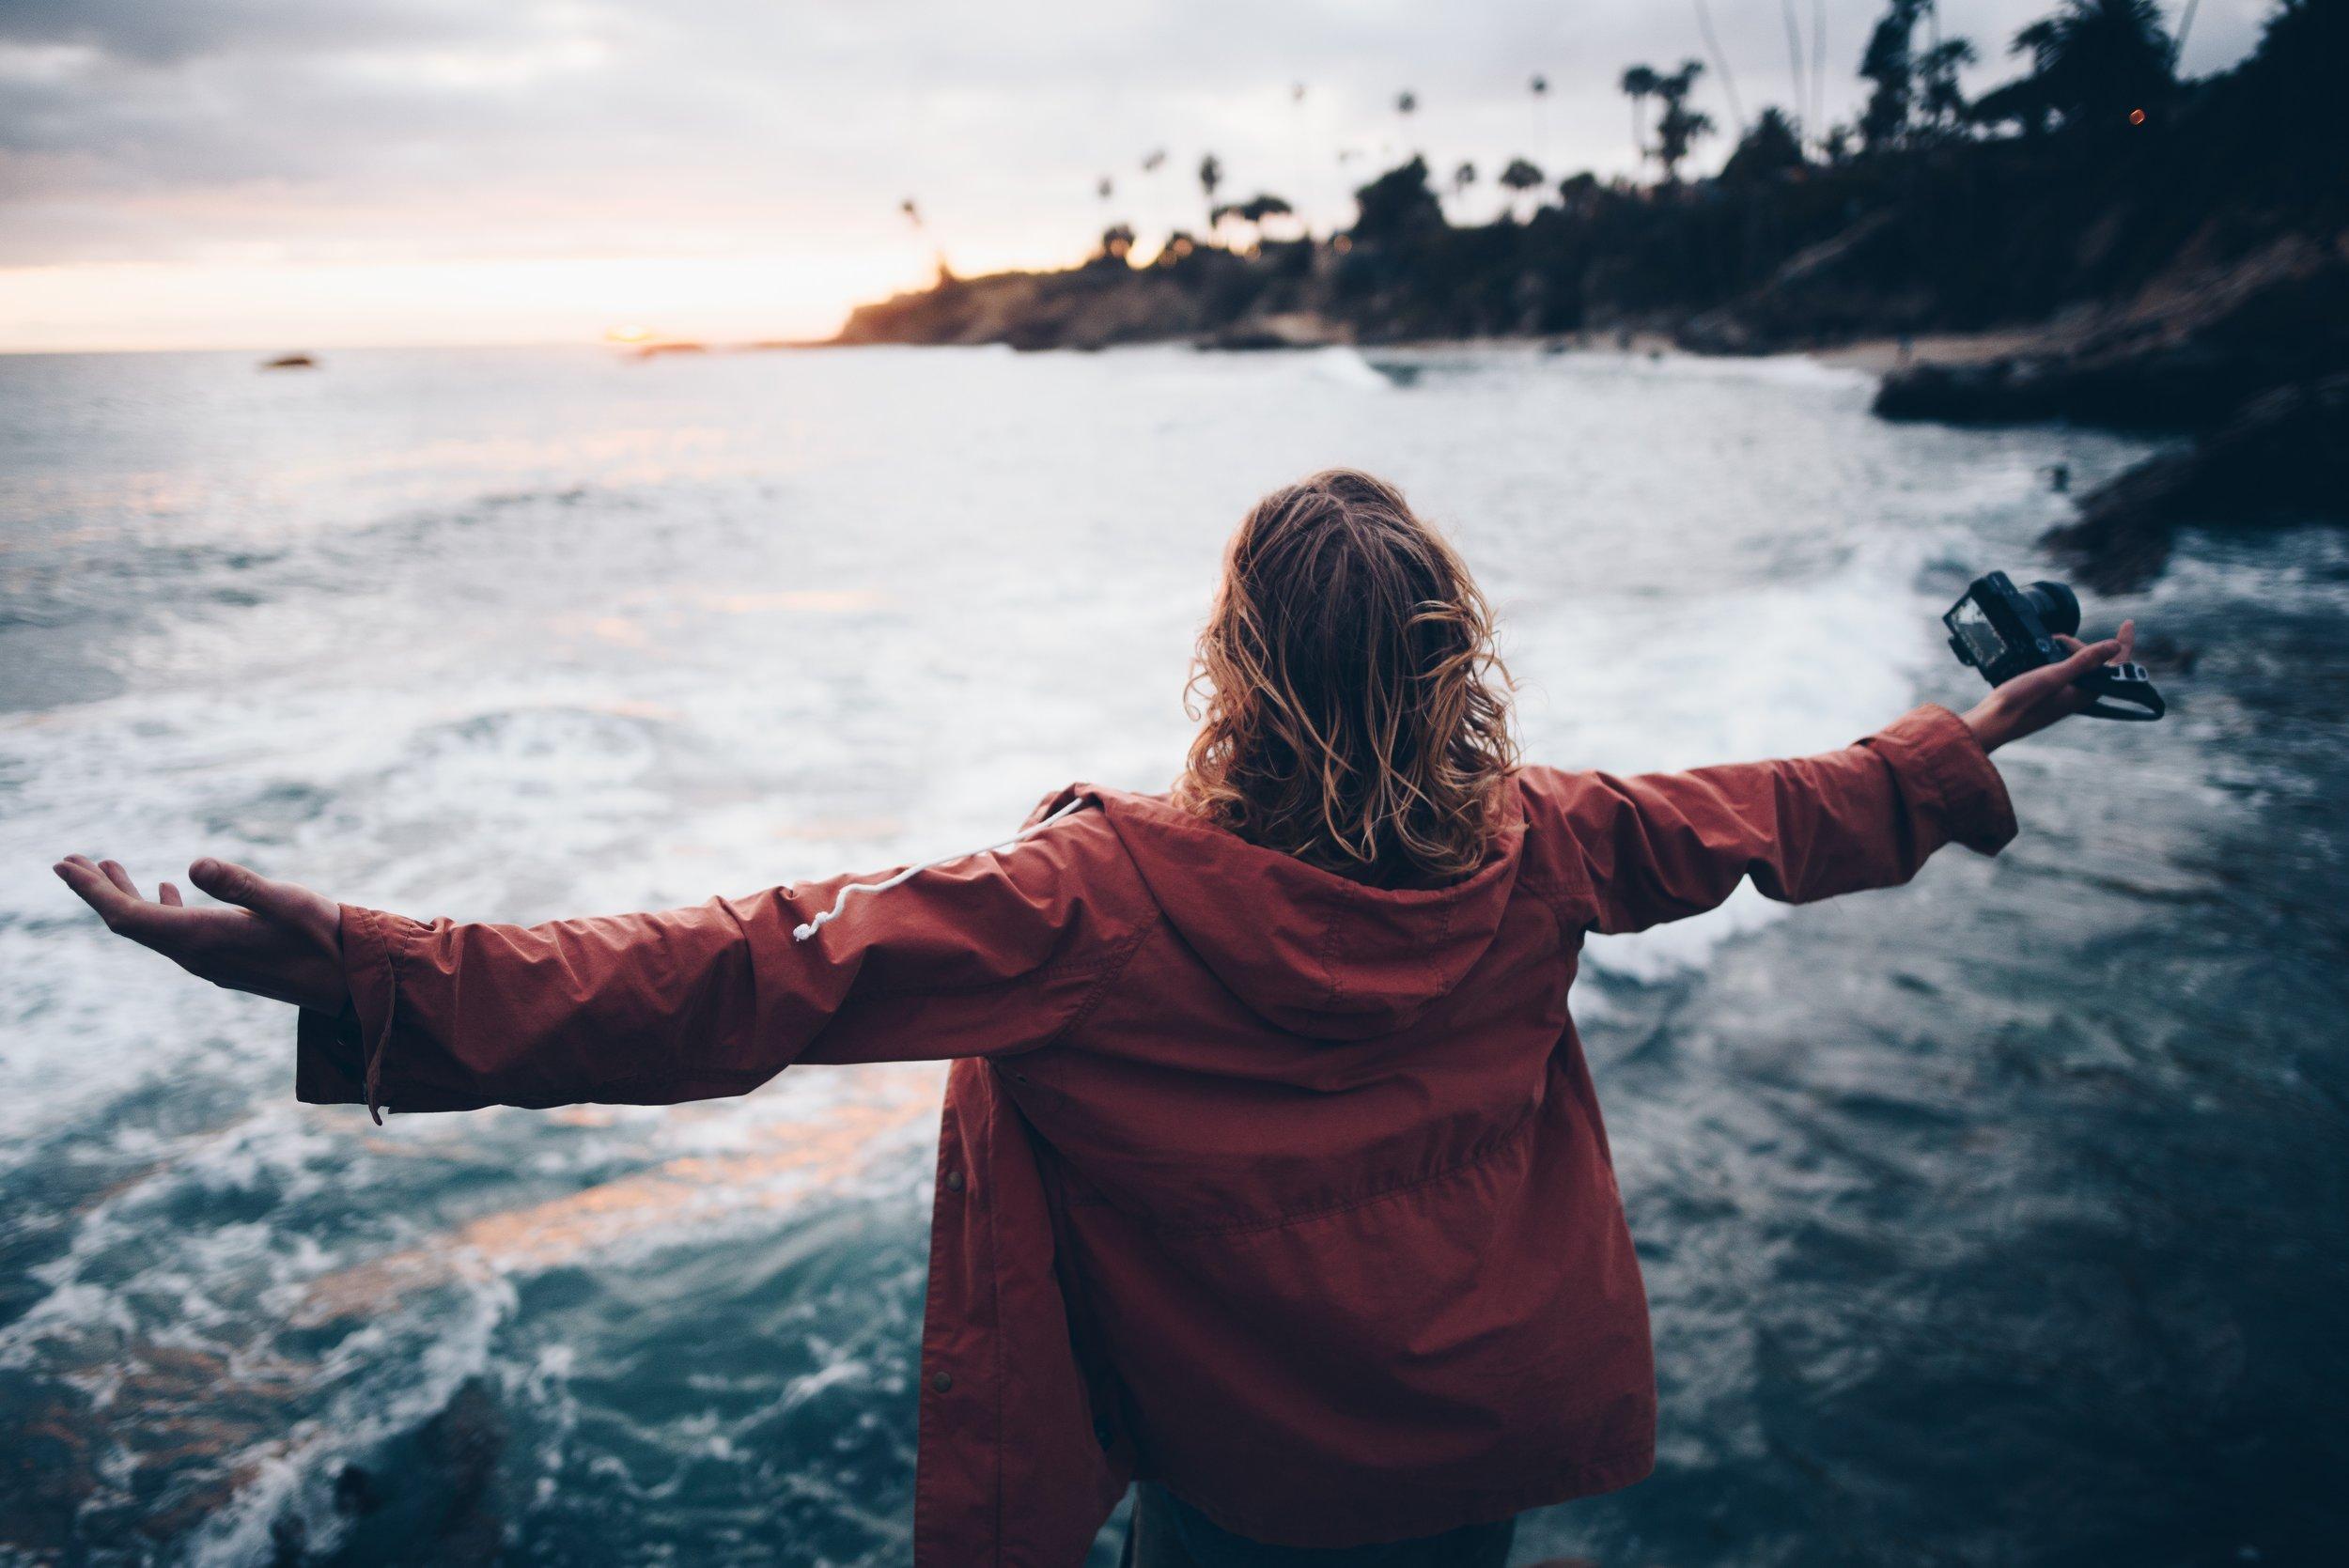 stephen-wawryk-luna-maha-alternative-views-how-to-free-yourself